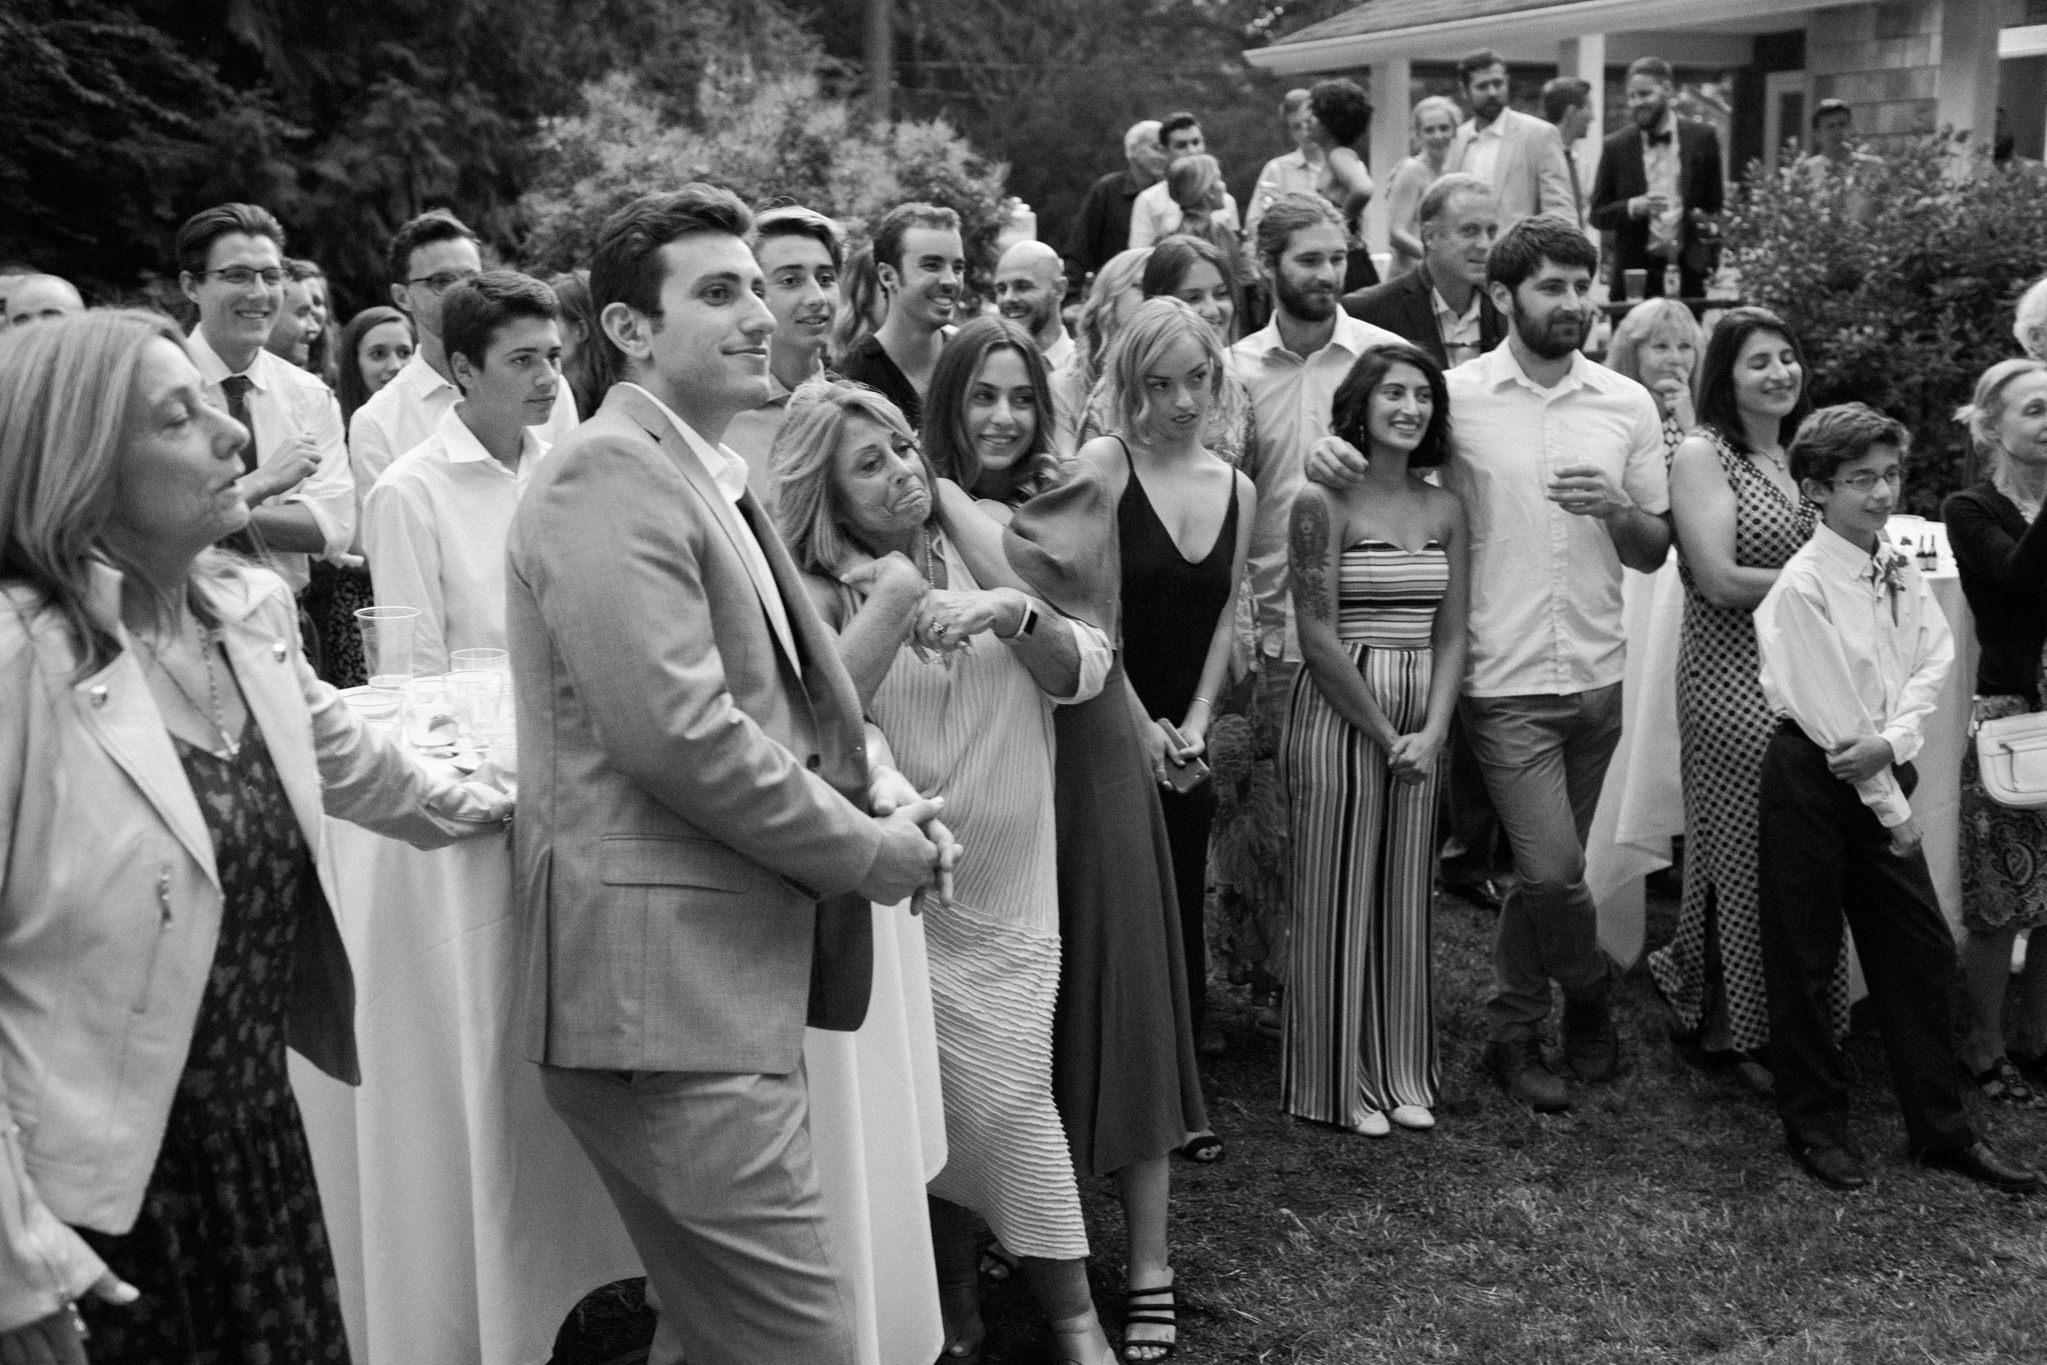 Backyard-Bainbridge-Island-Wedding-Alycia-Lovell-Photography-232.JPG